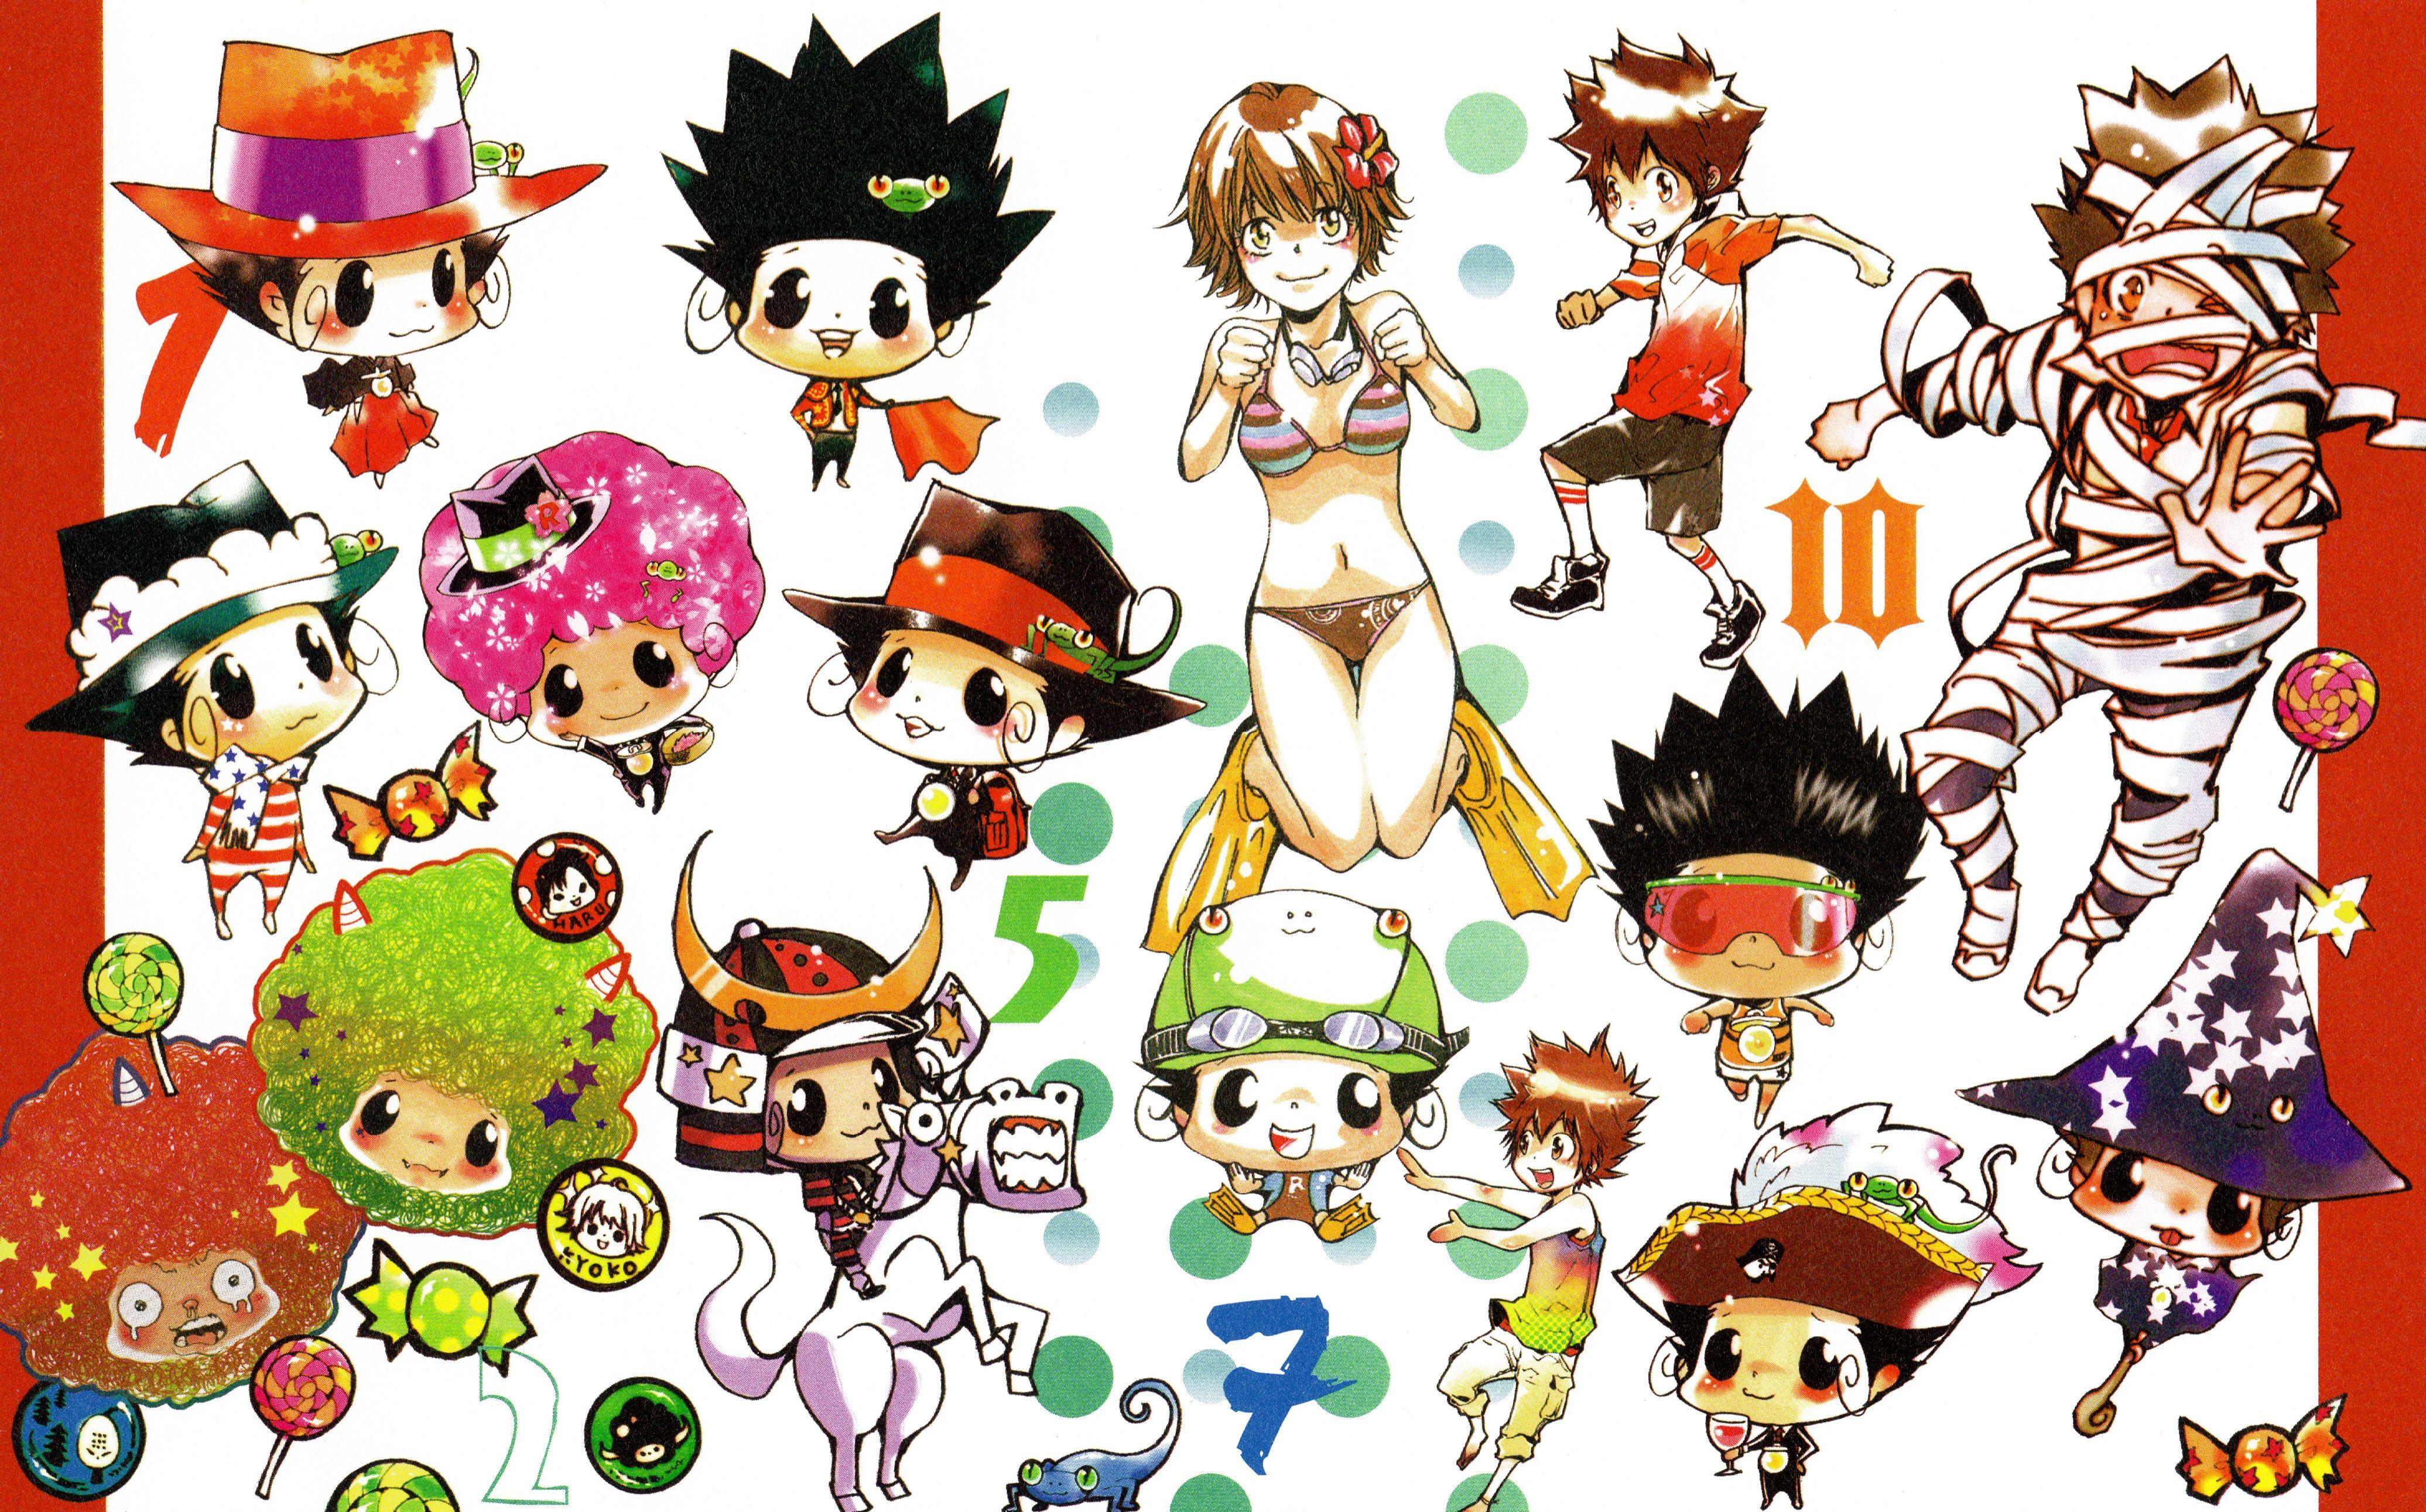 Amano Akira, Katekyo Hitman REBORN!, Colore!, Sawada Tsunayoshi, Sasagawa Kyoko, Lambo